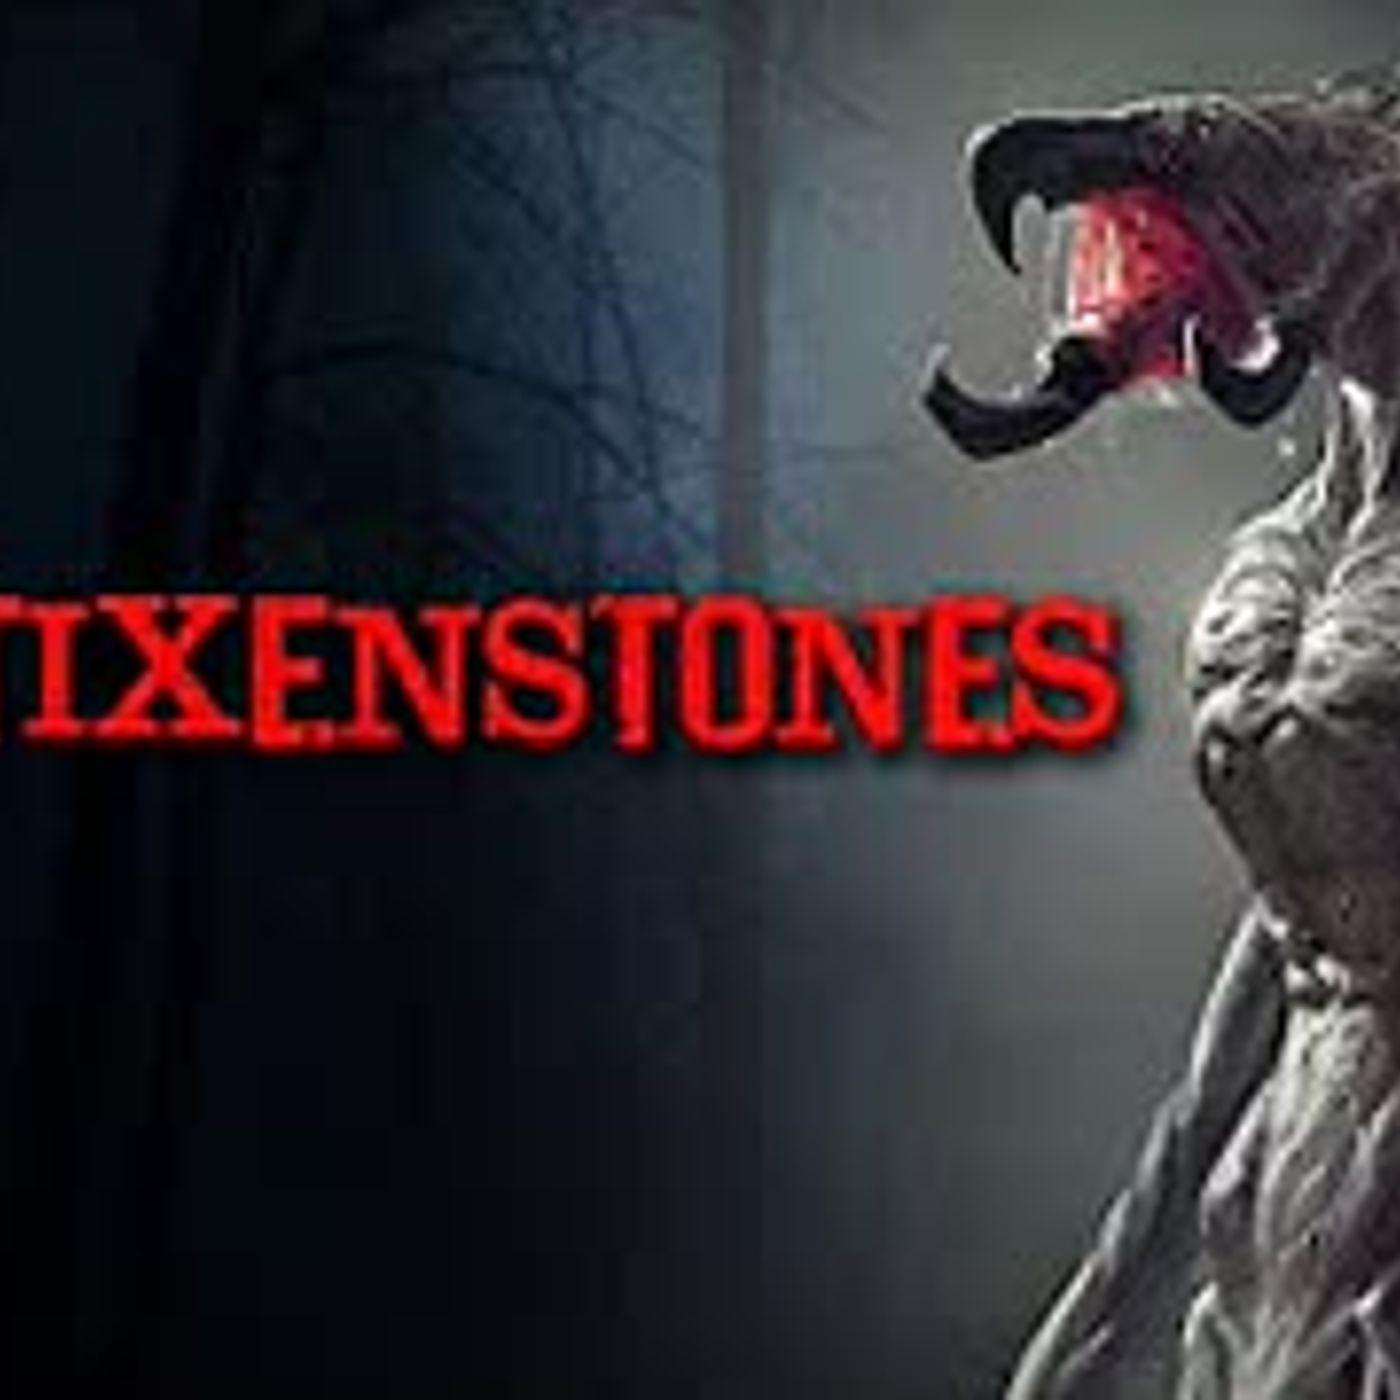 """Mr. Stixenstones"" Creepypasta"